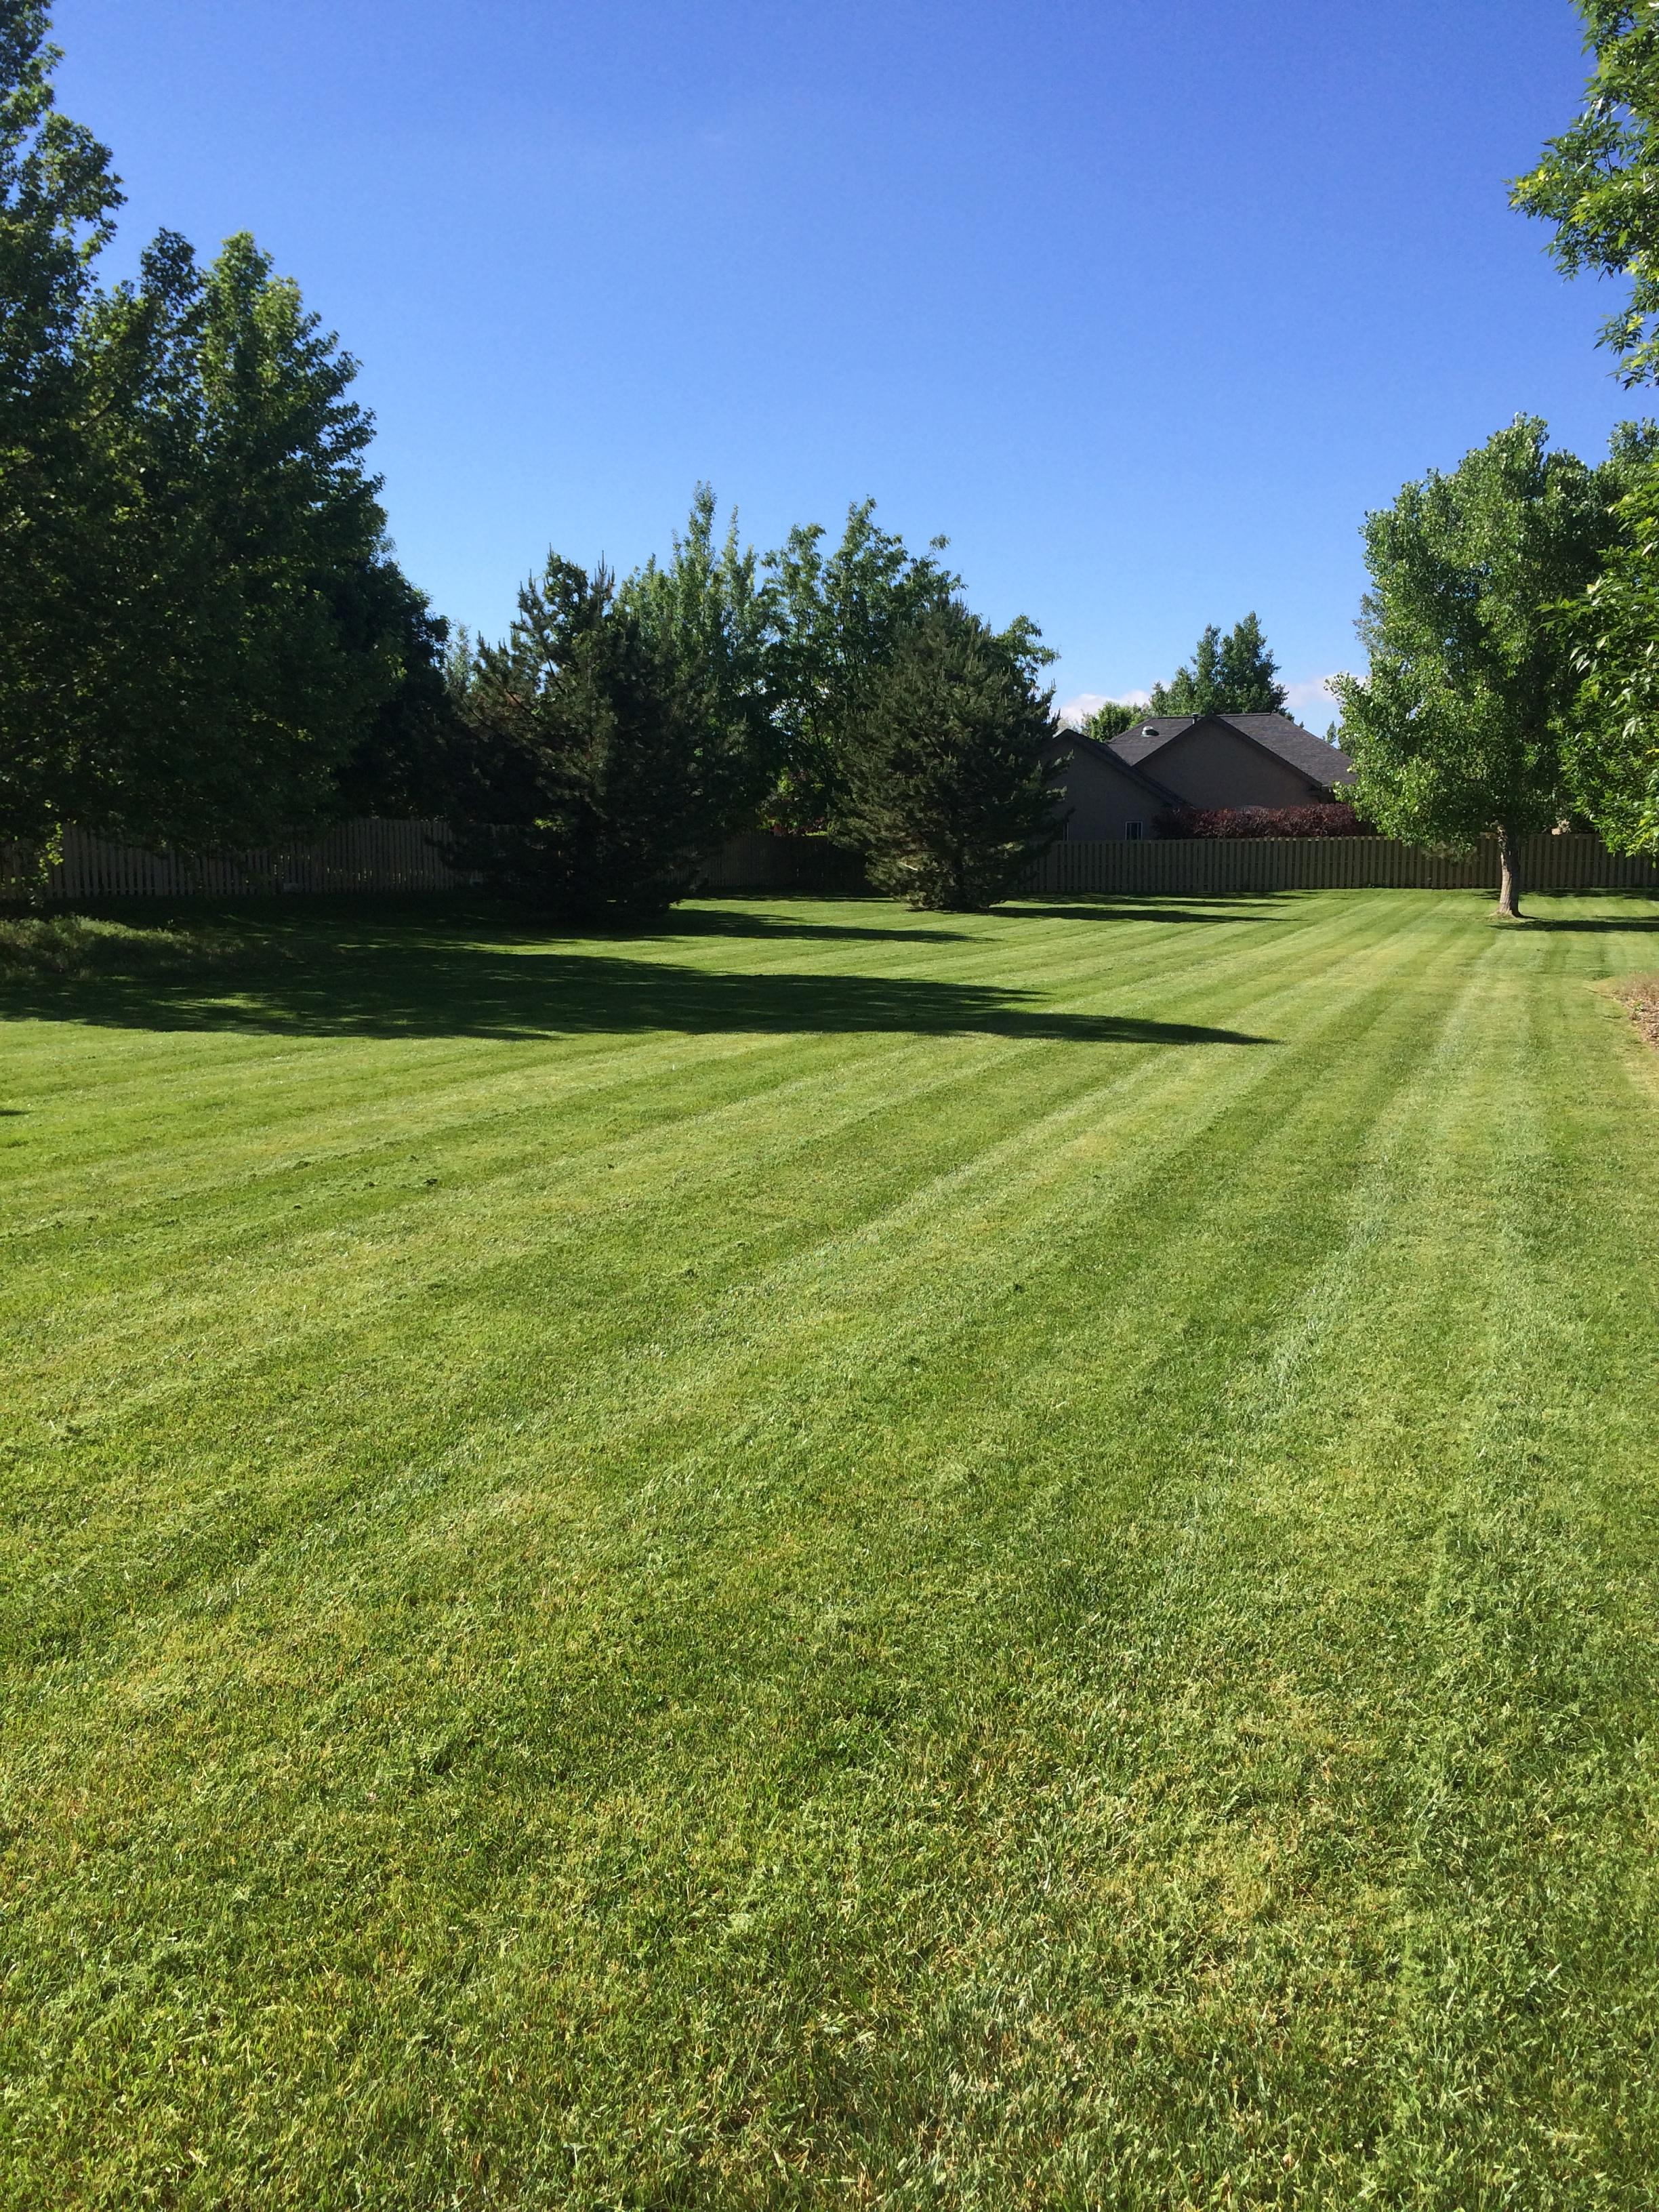 Maple Leaf Landscaping Amp Maintenance Inc Landscape